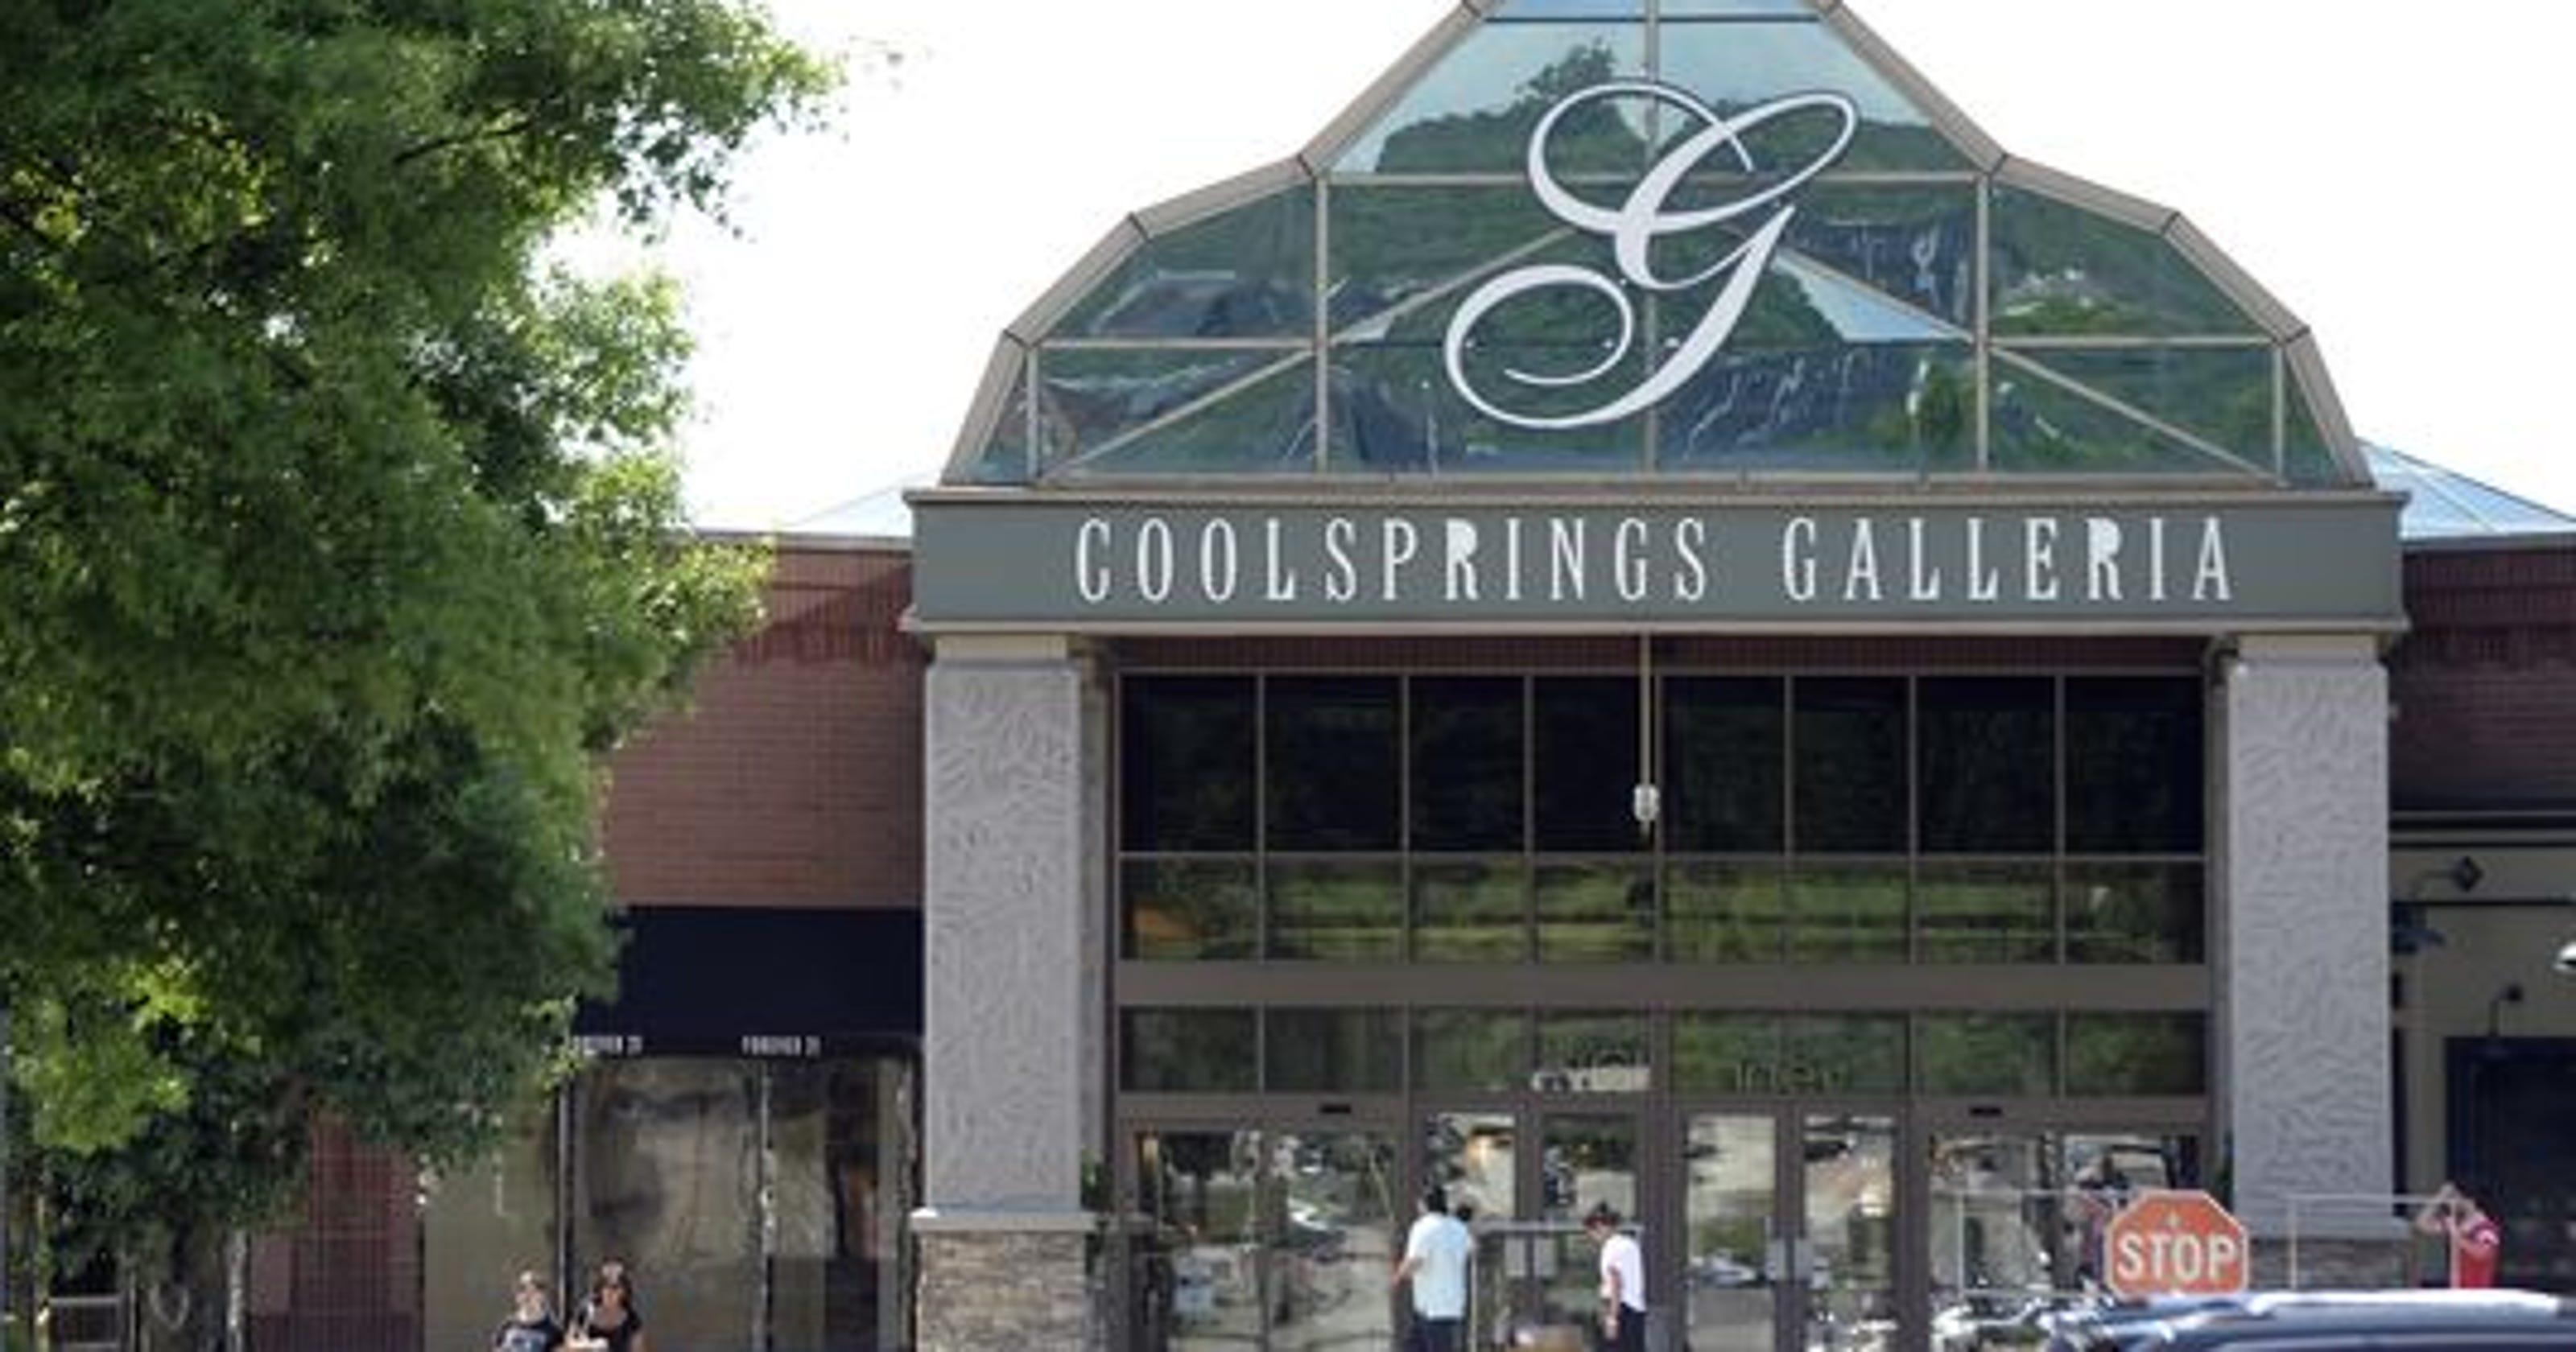 Ulta Beauty opening CoolSprings Galleria location